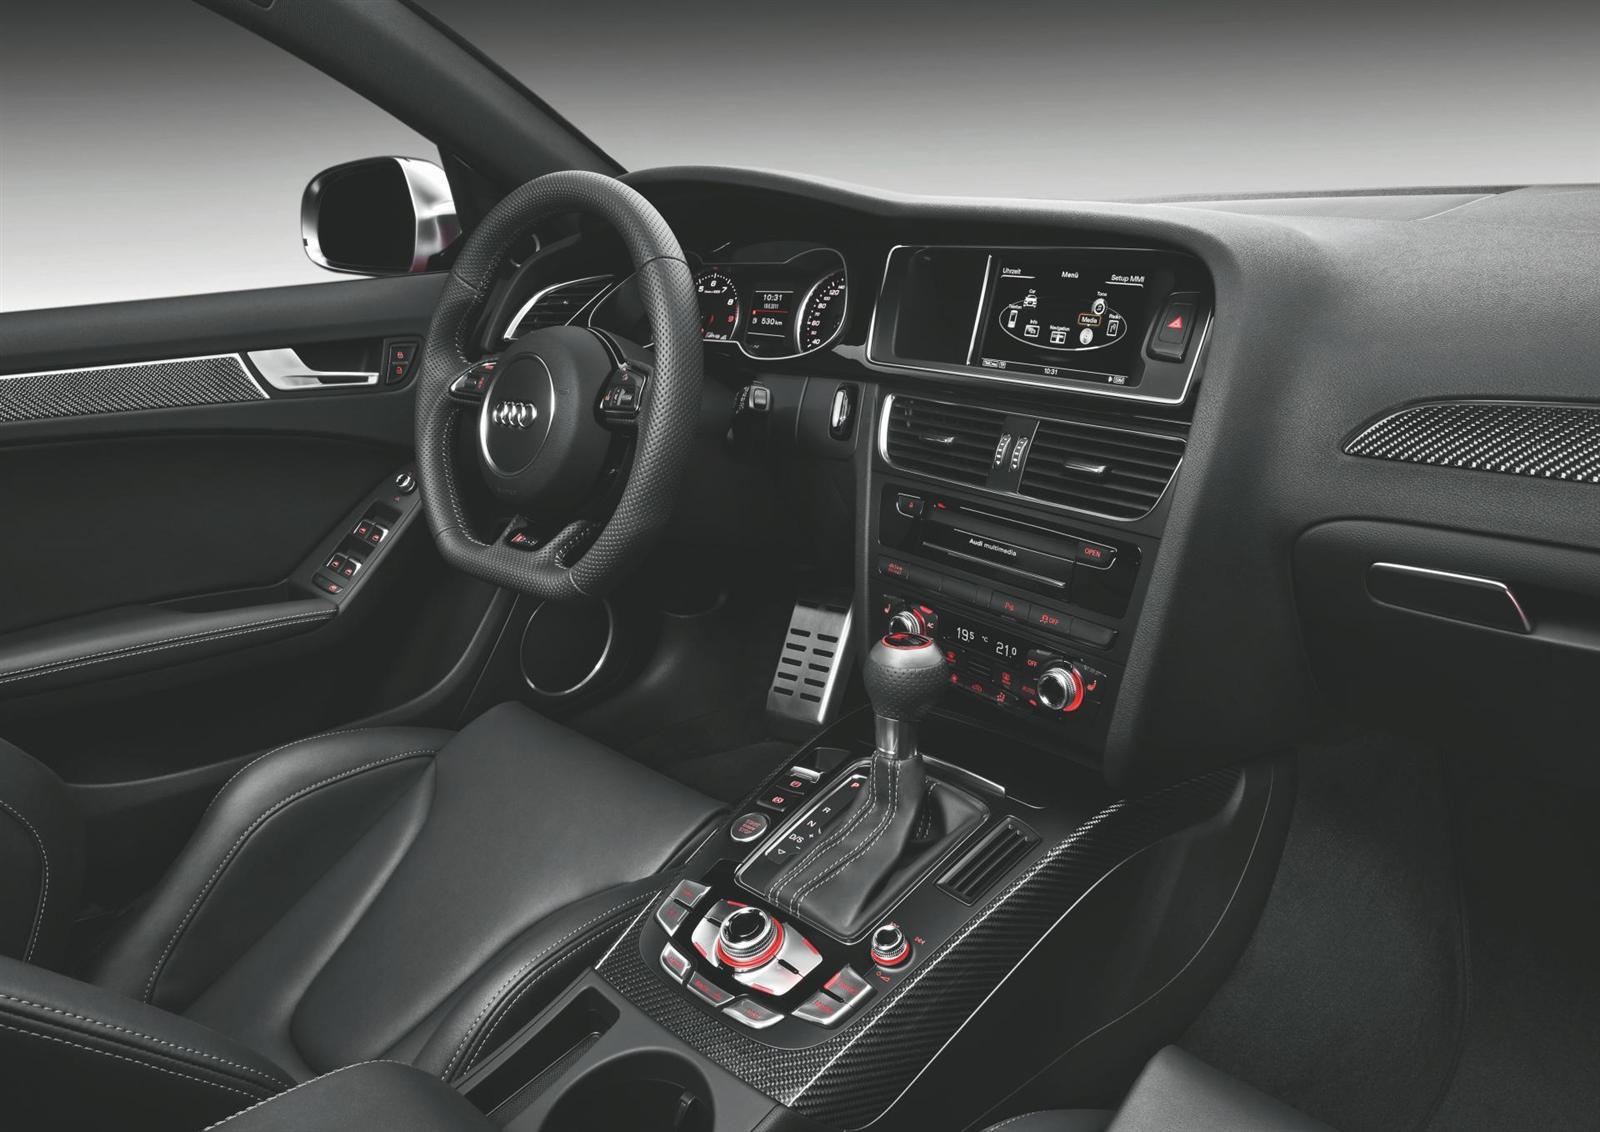 2012 Audi RS 4 Avant Image